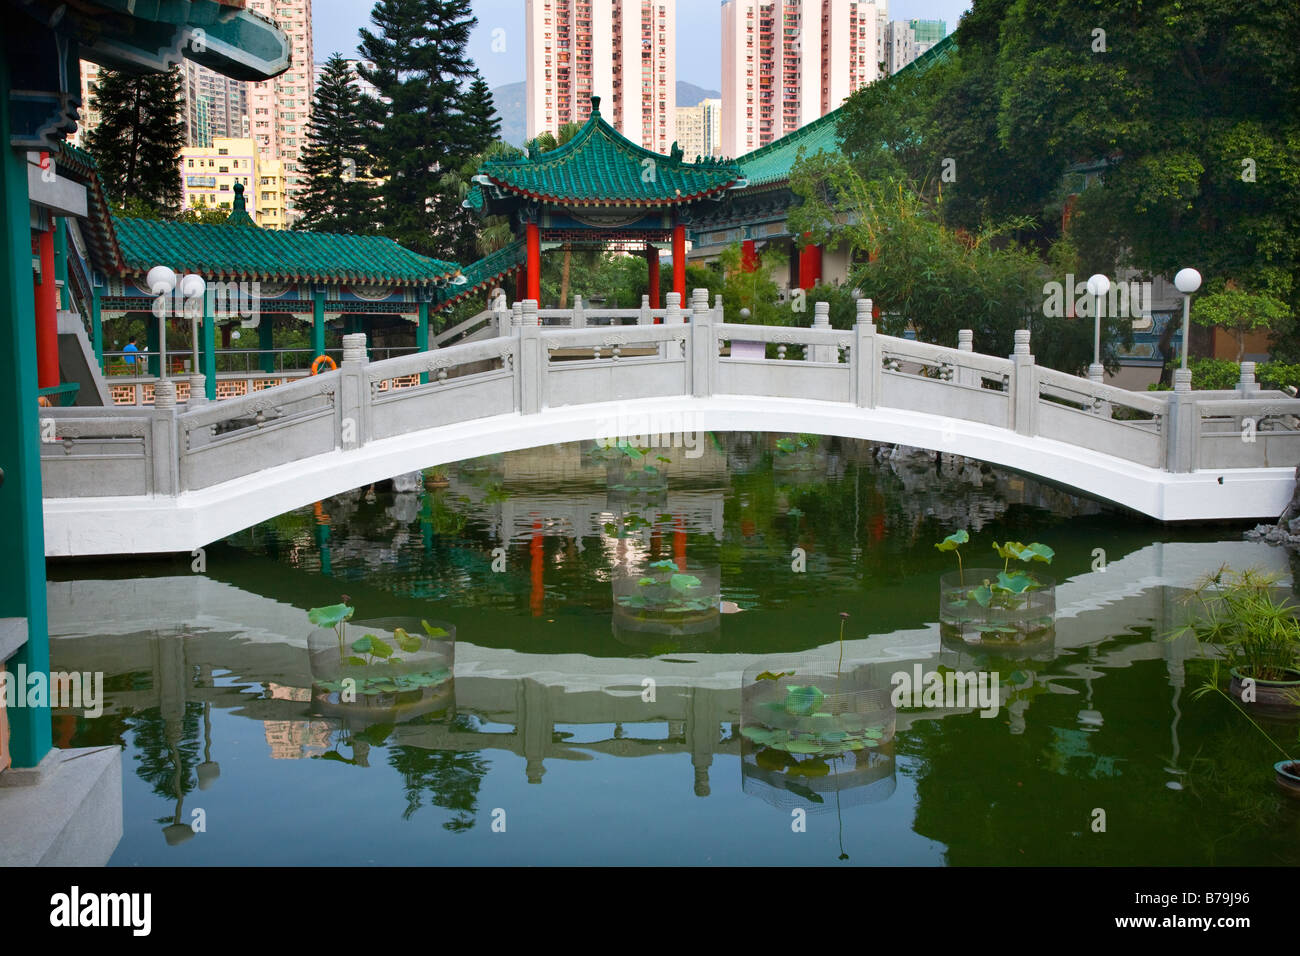 Elegant Chinese Water Garden Bridge And Reflection Amid Modern High Rise Buildings  Wong Tai Sin Taoist Temple Kowloon Hong Kong Design Ideas